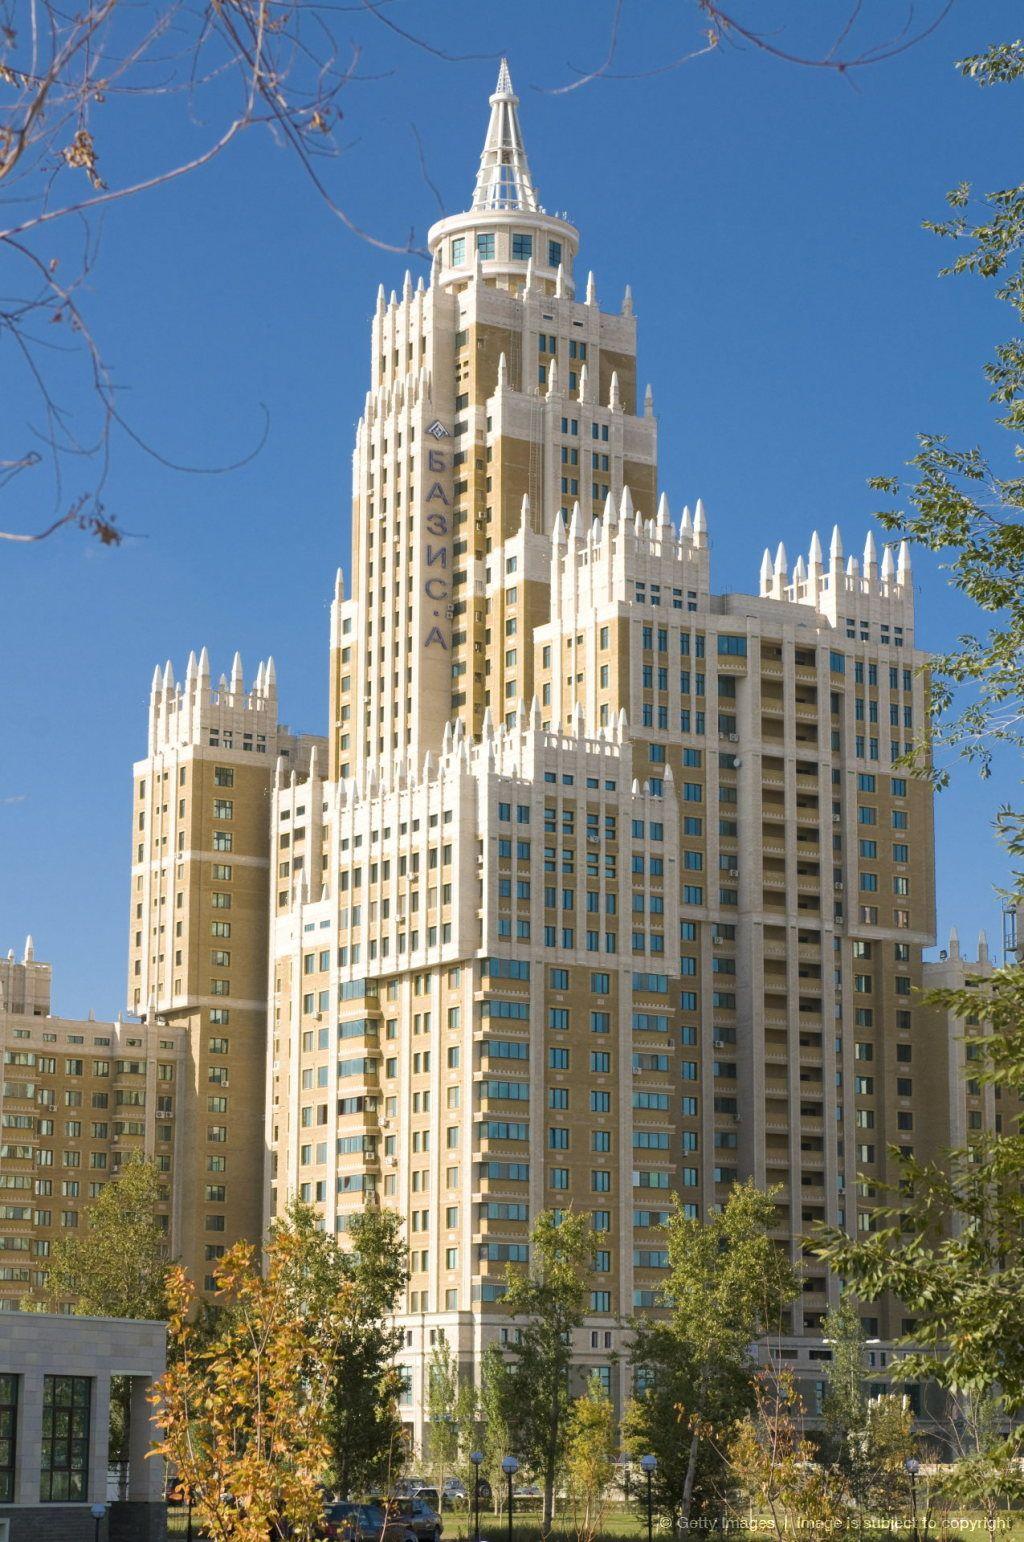 Astana tower, Astana, Kazakhstan, Central Asia